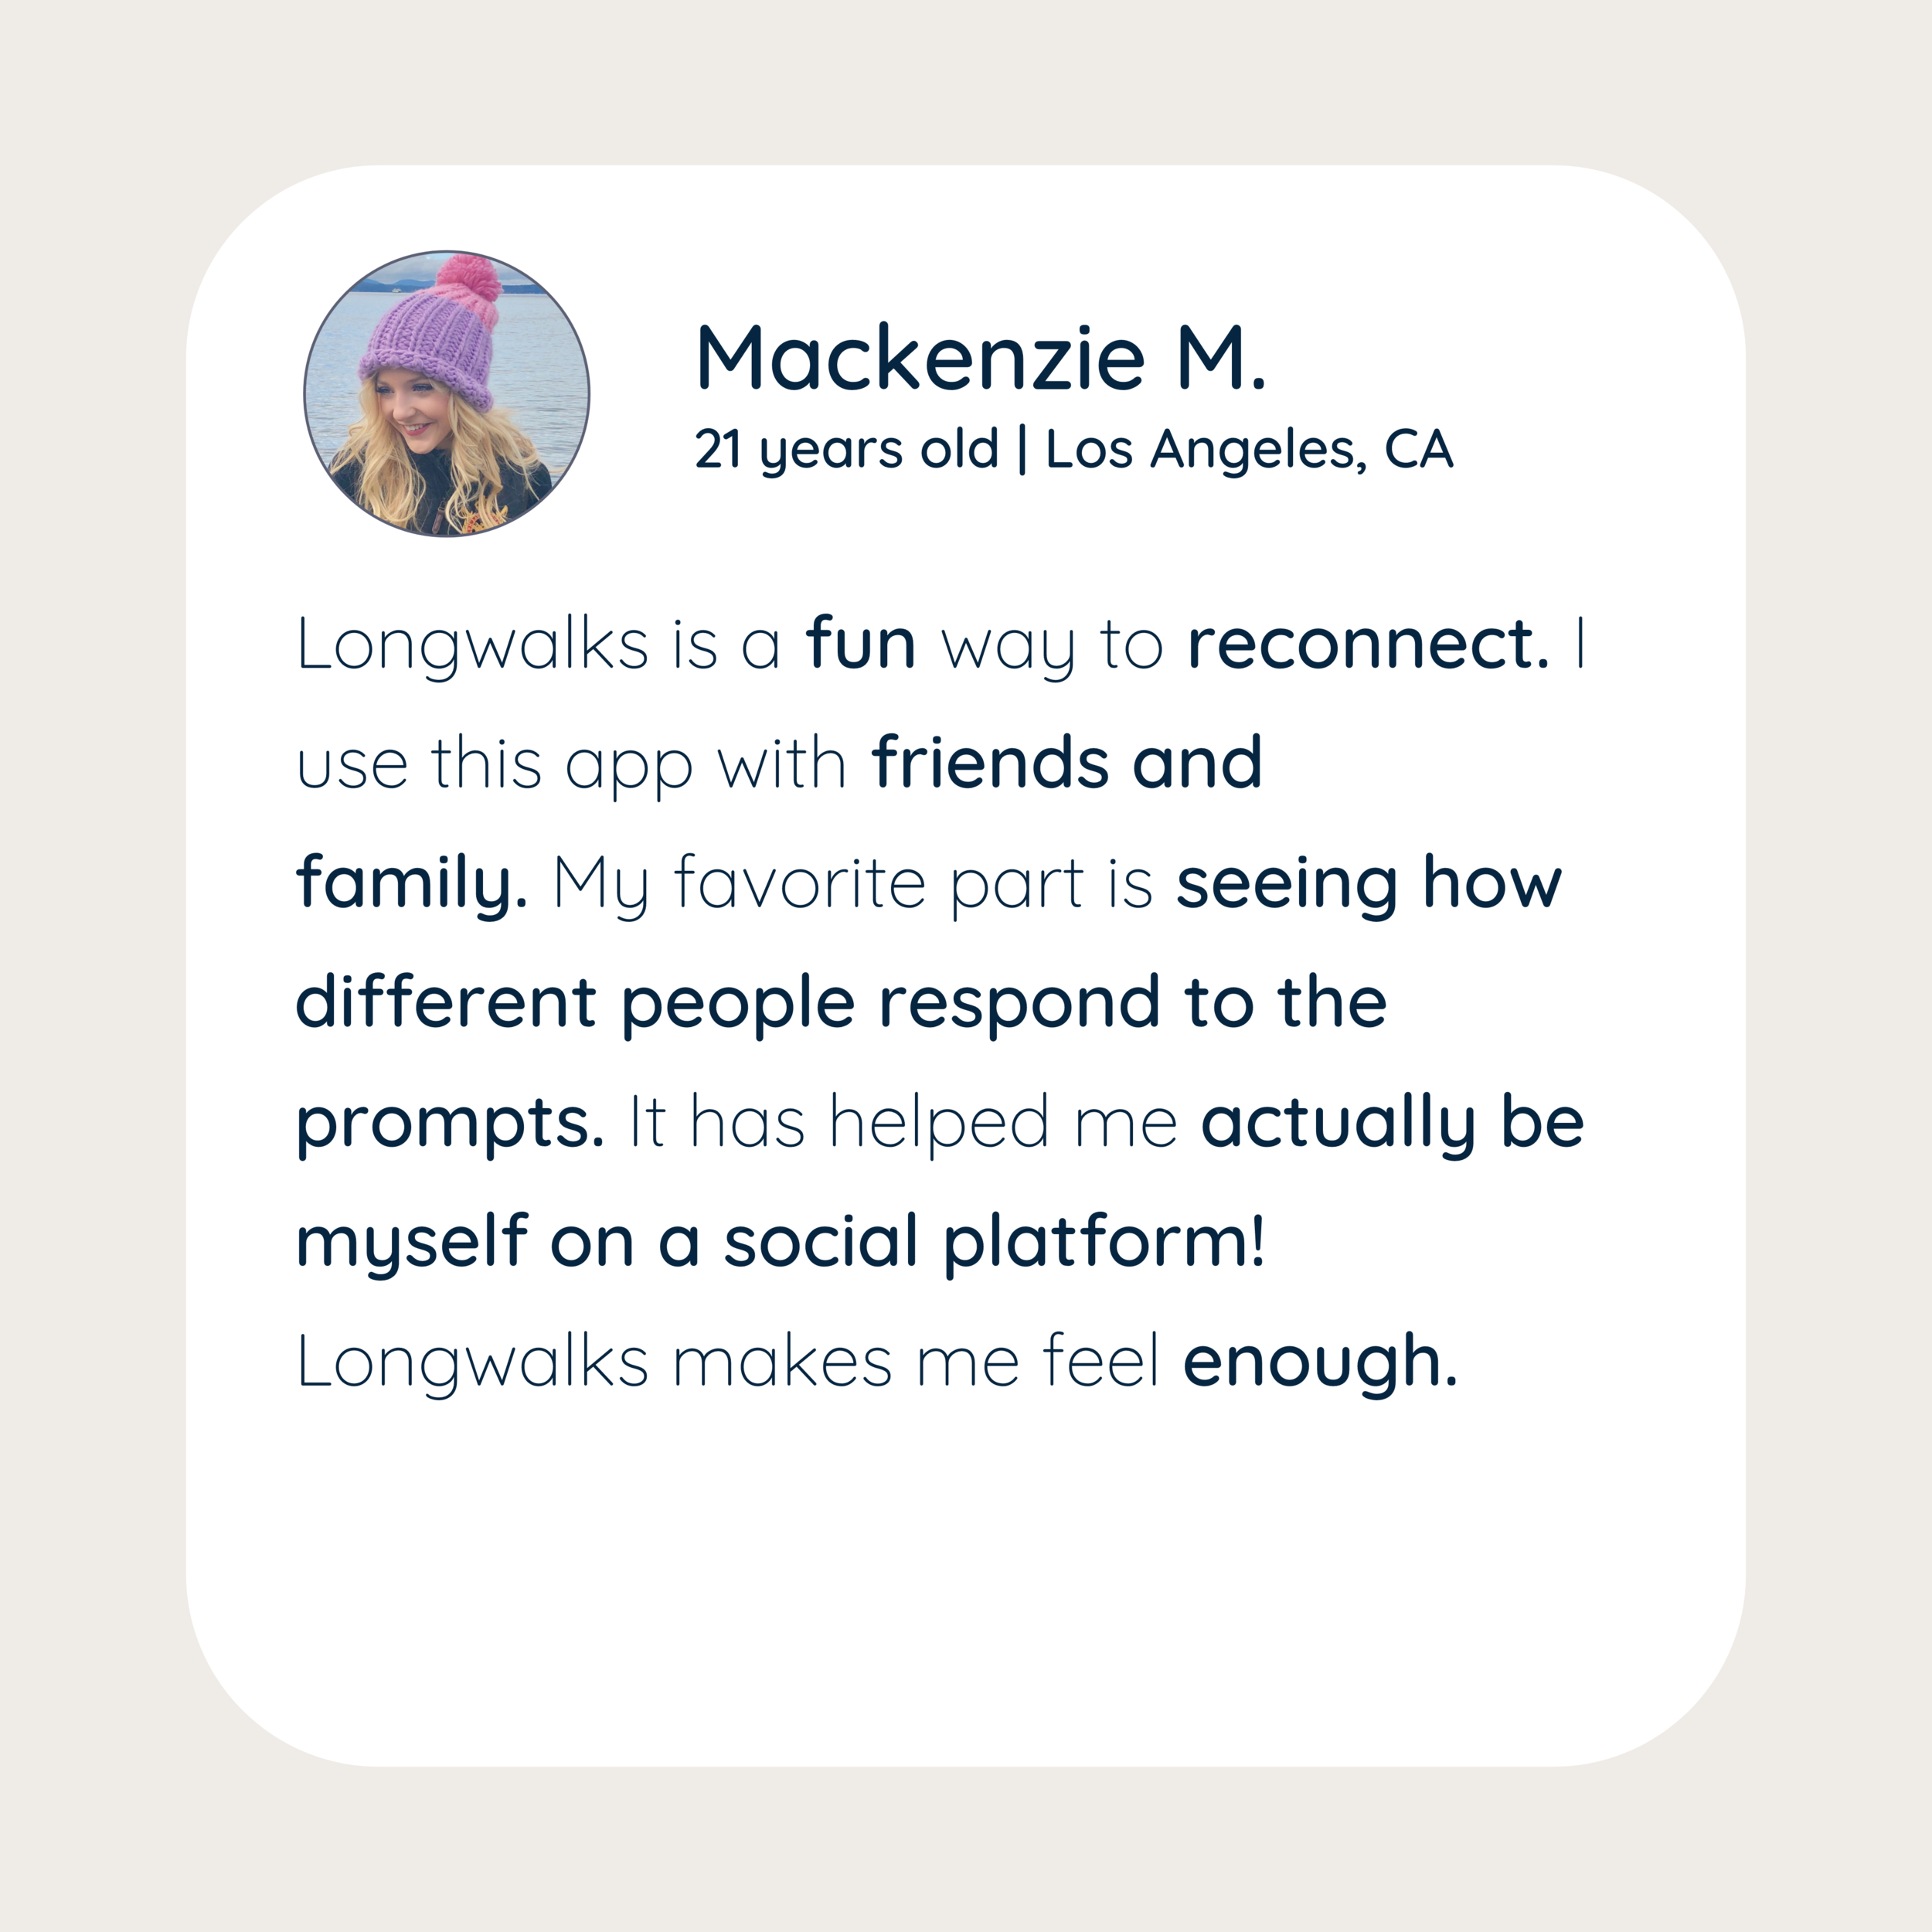 mack review.png